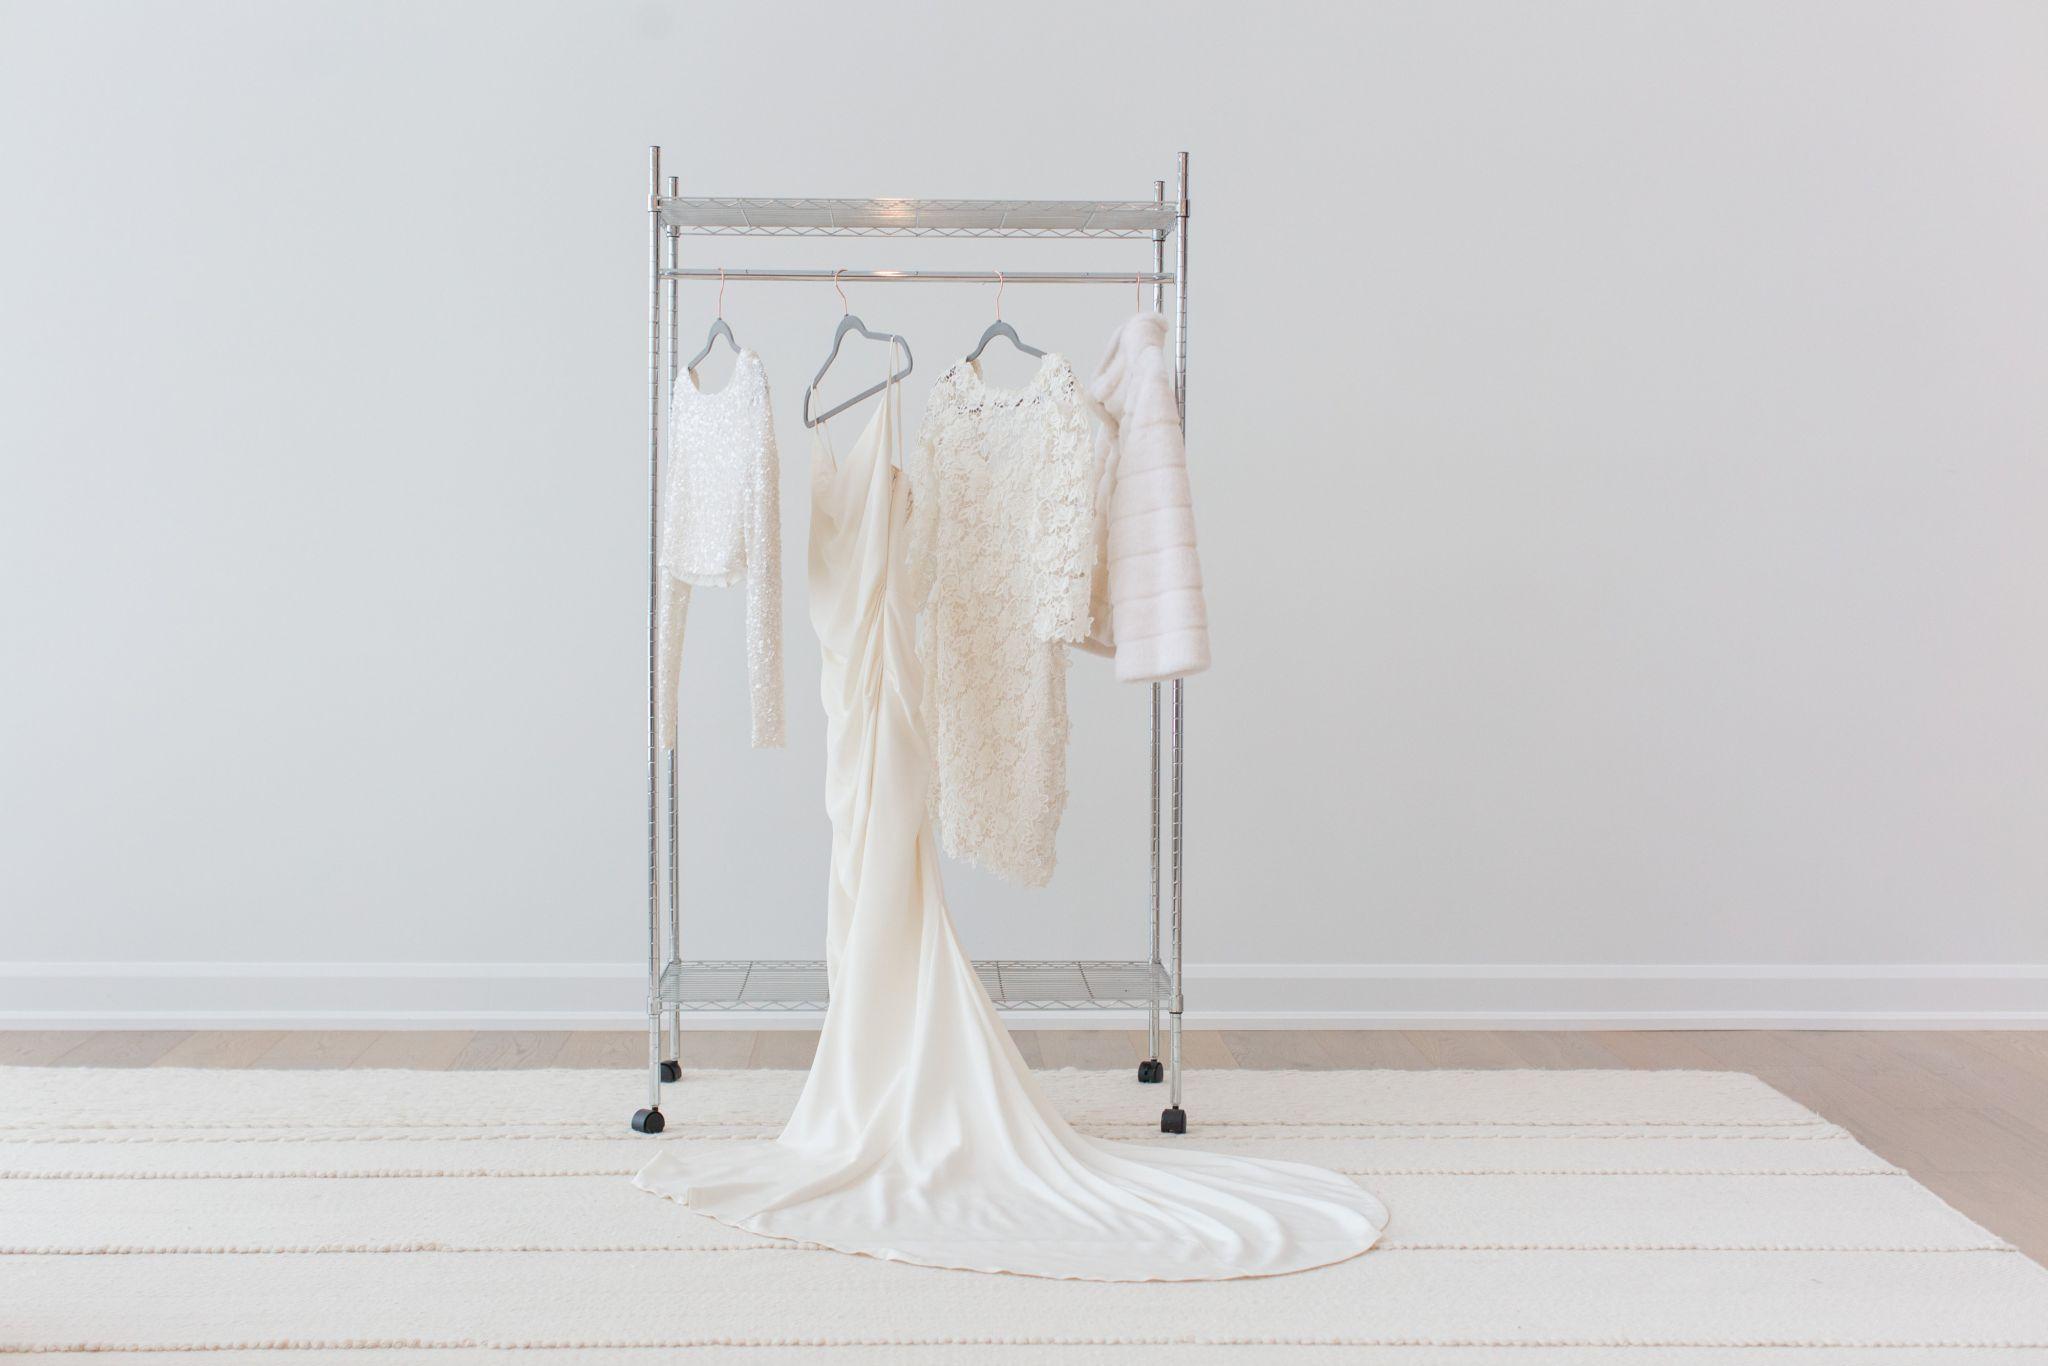 wedding dress on rolling rack, how to display your wedding dress